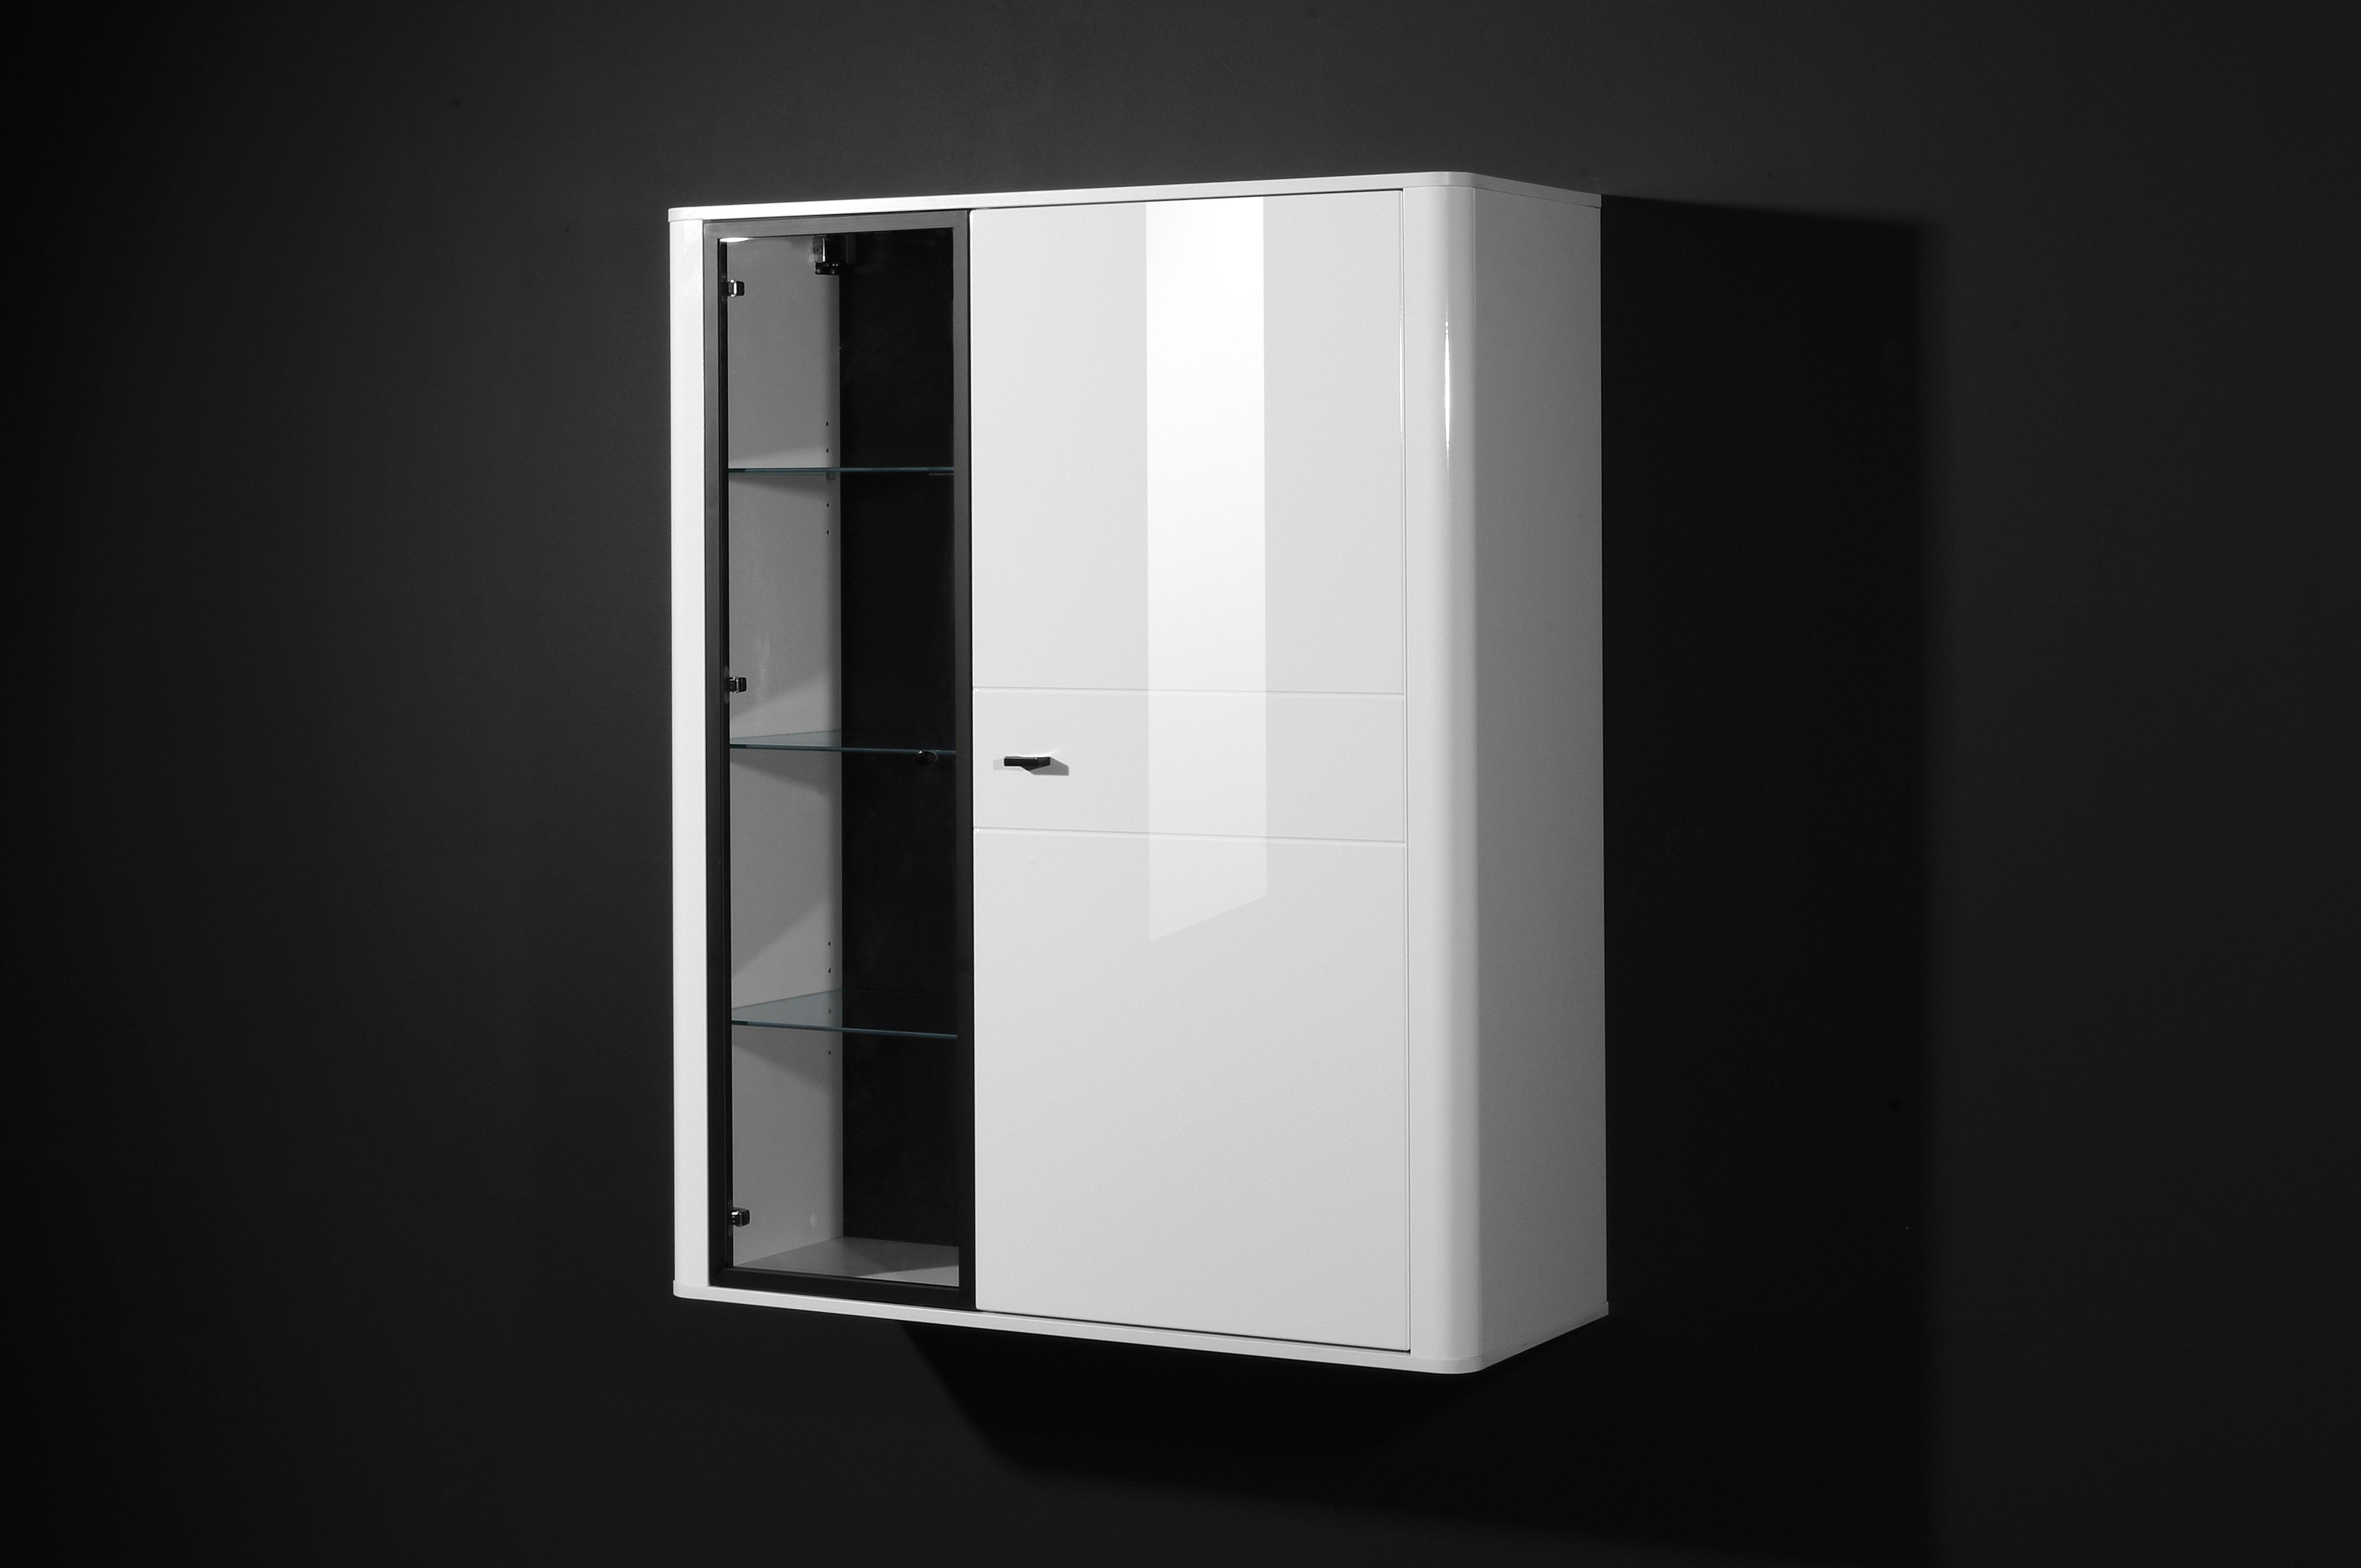 4tlg wohnwand mod so188 weiss hochglanz h c m bel. Black Bedroom Furniture Sets. Home Design Ideas